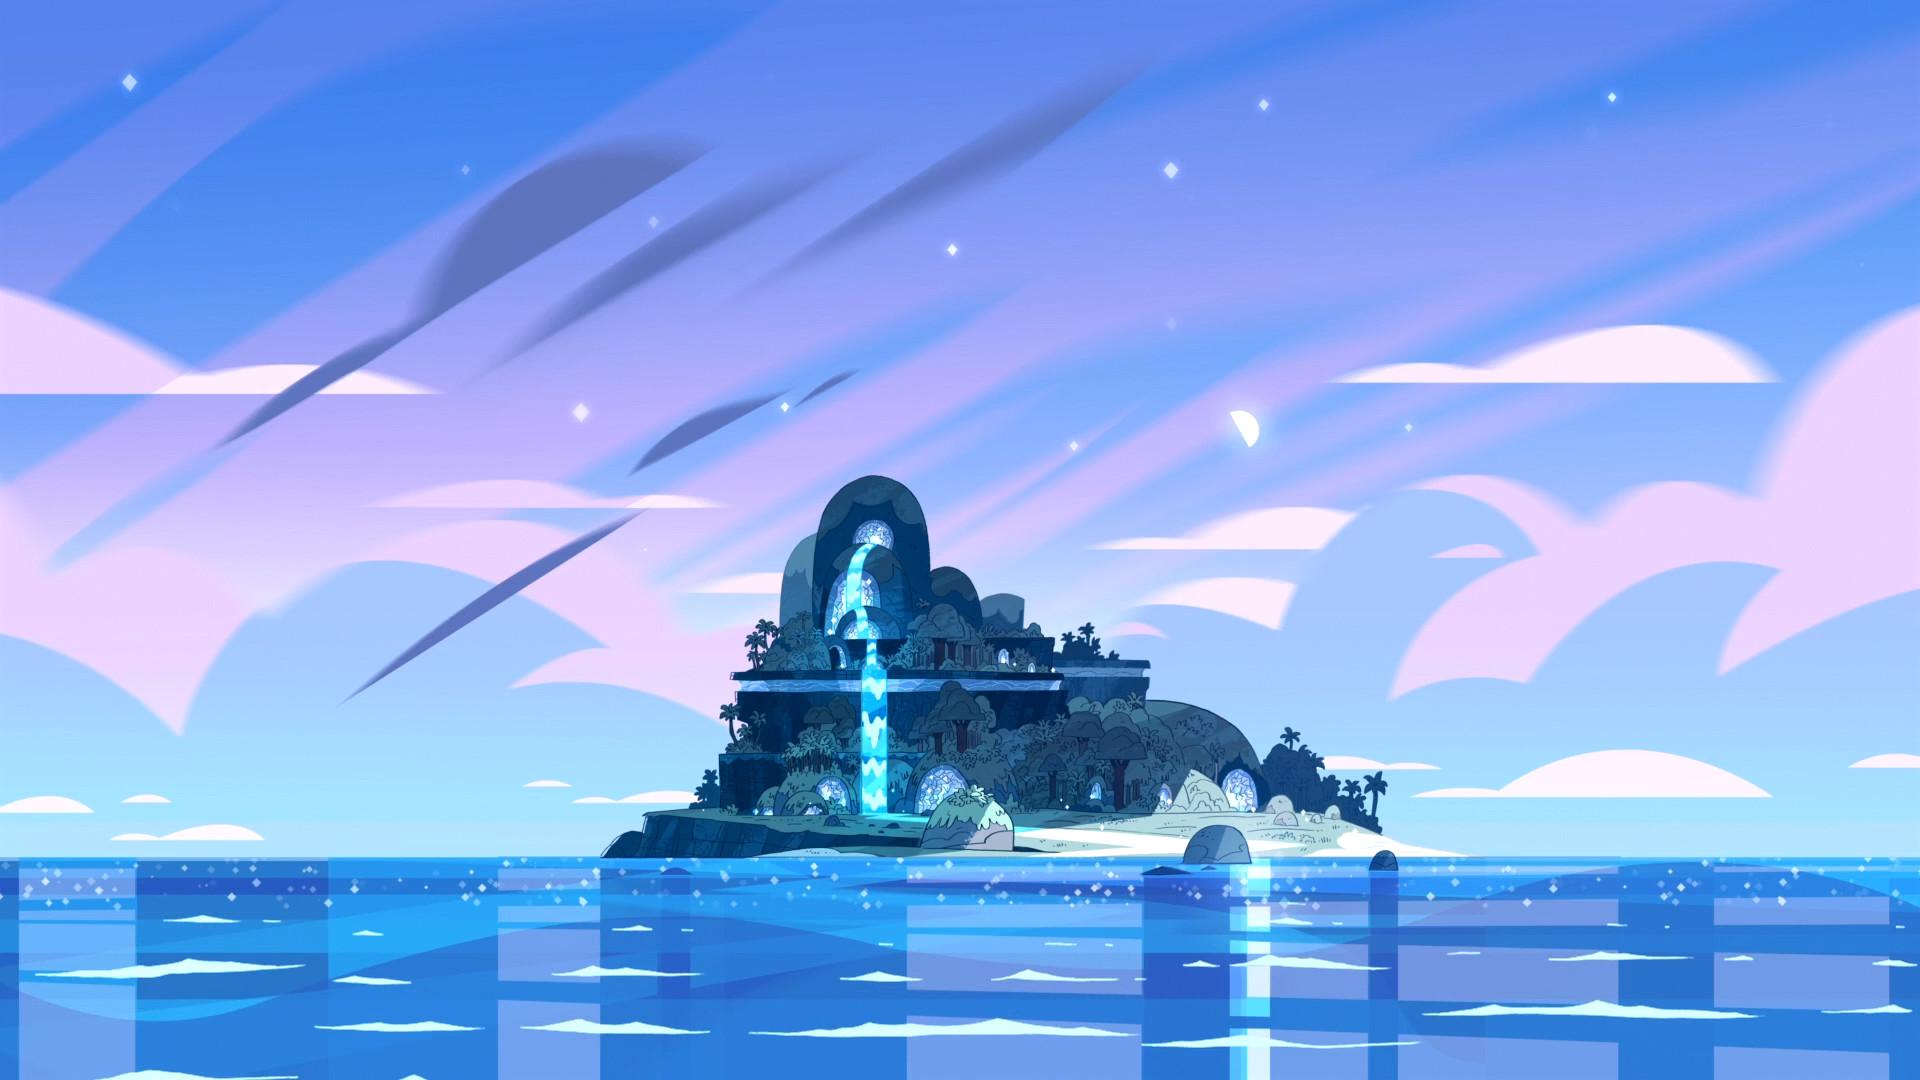 WALLPAPERS The Universe of Steven Universe Season 1